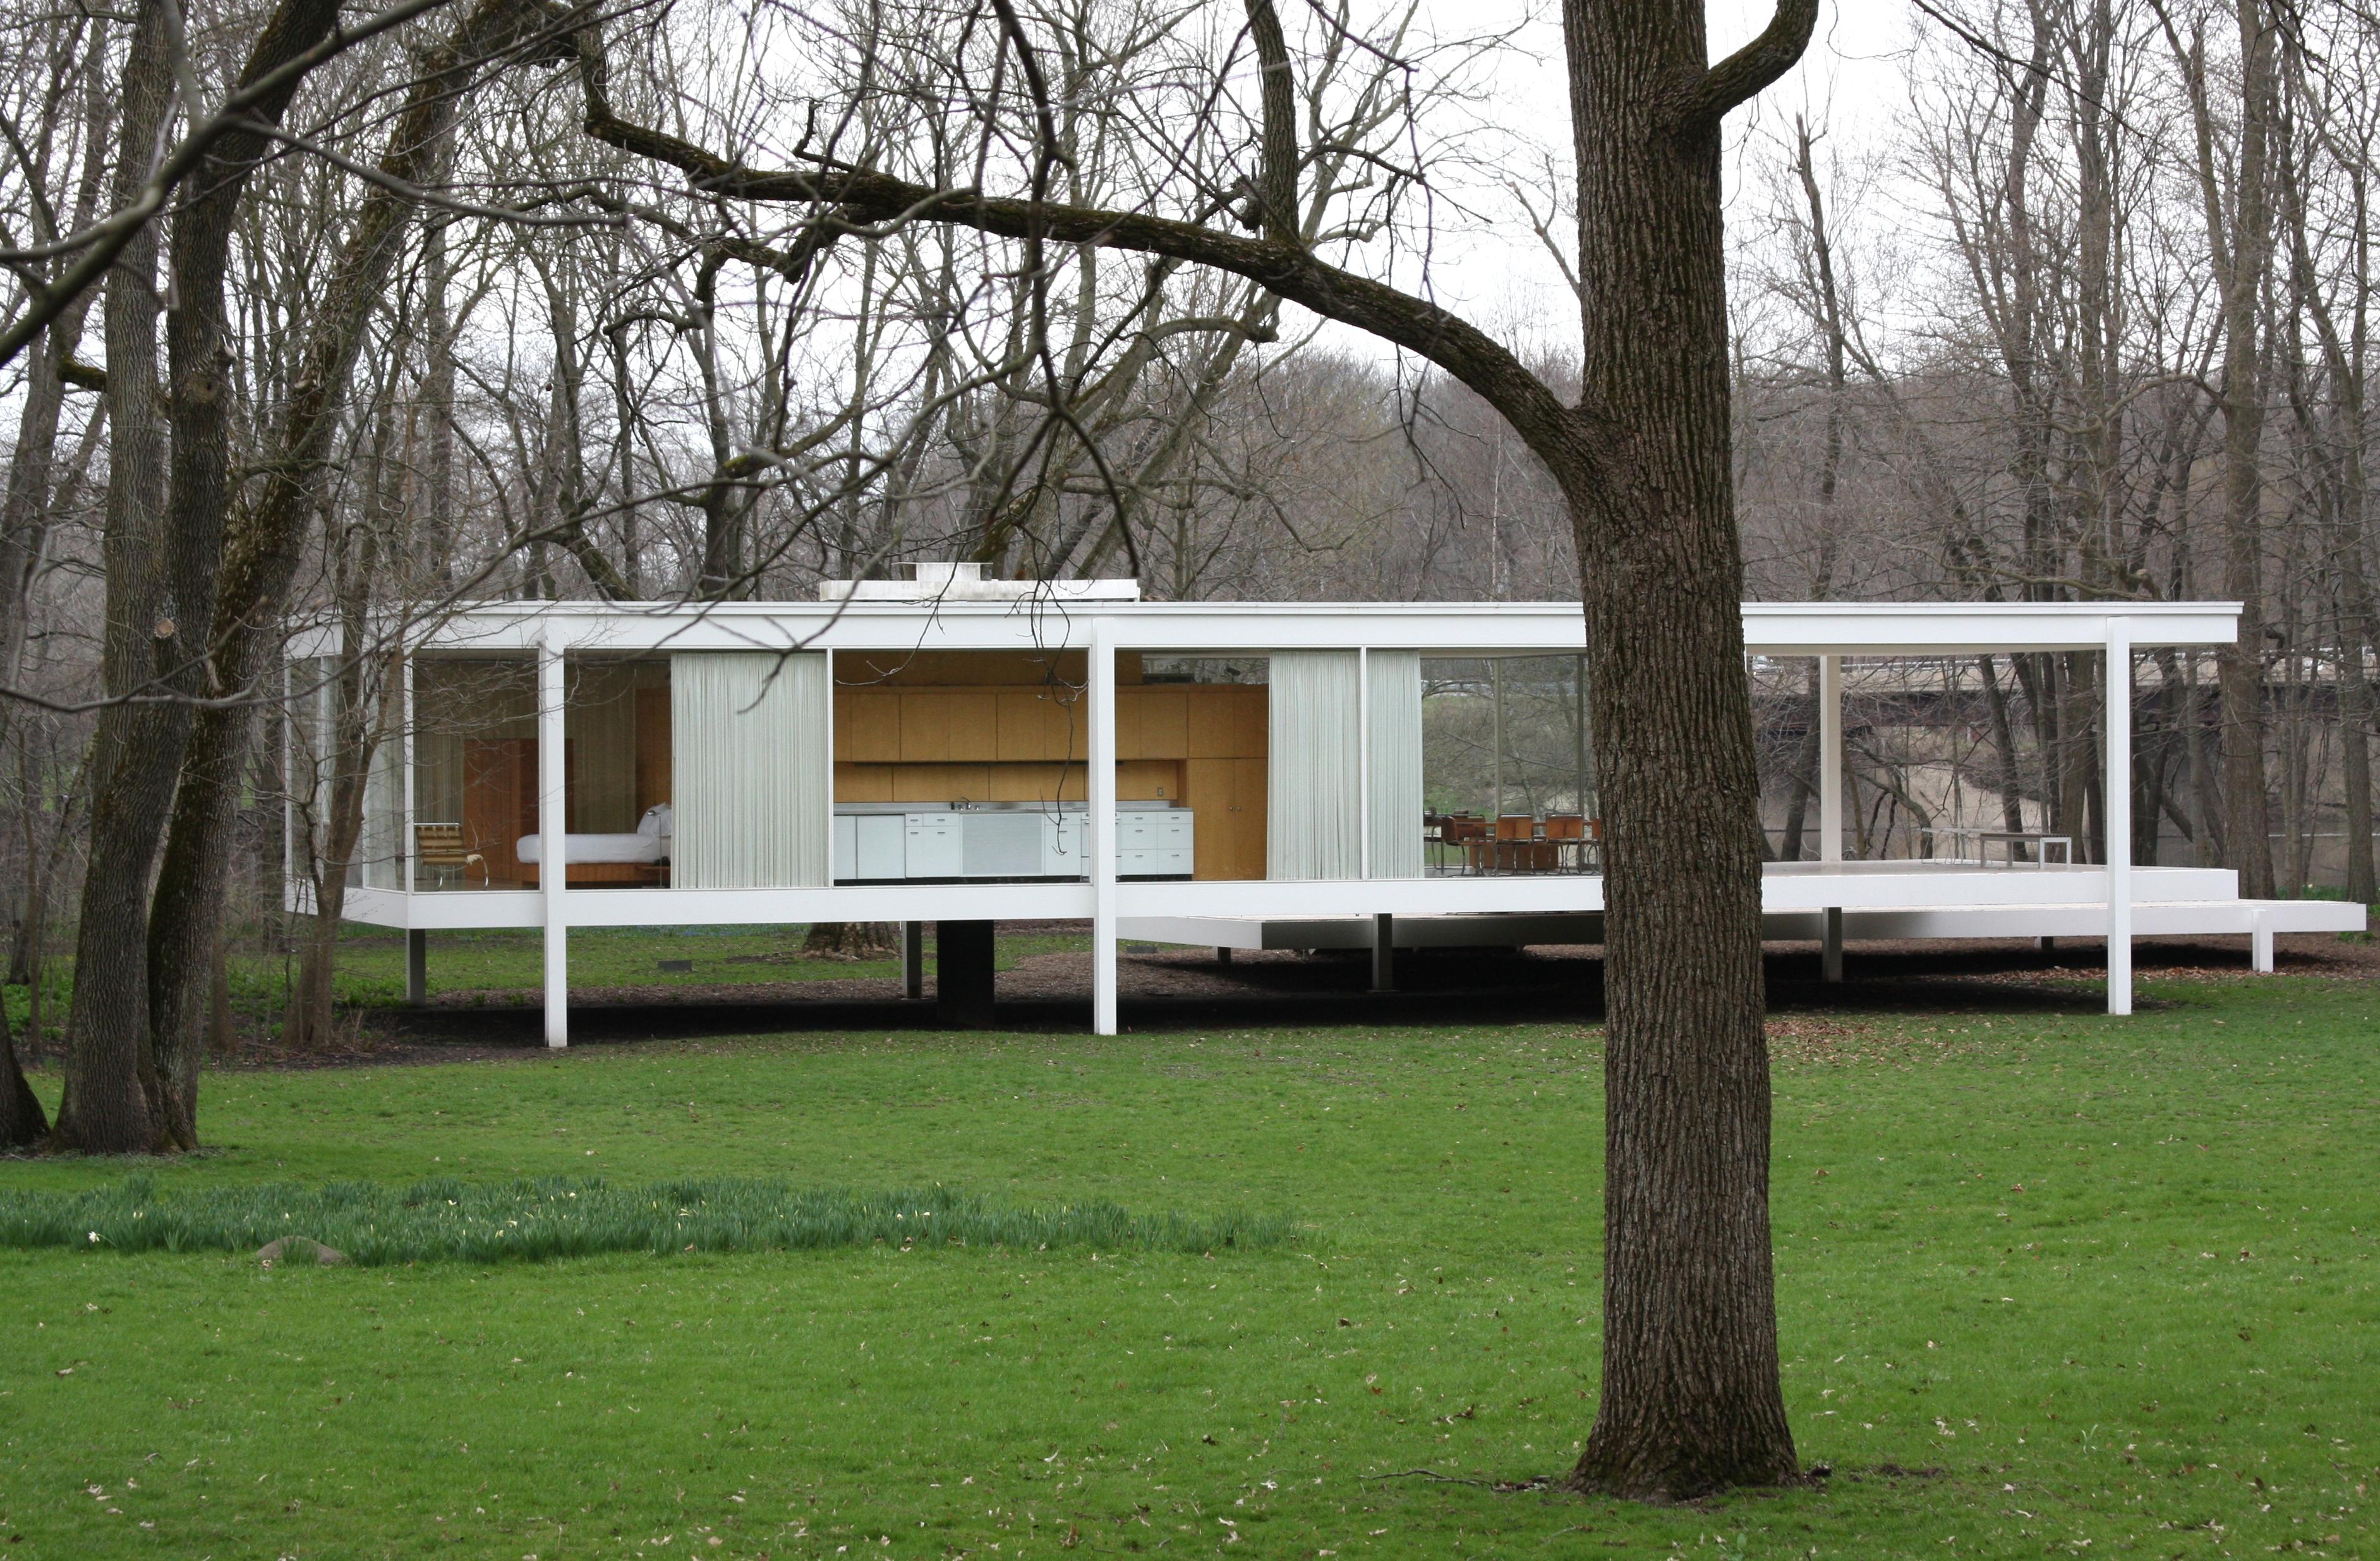 file farnsworthhouse mies wikimedia commons. Black Bedroom Furniture Sets. Home Design Ideas